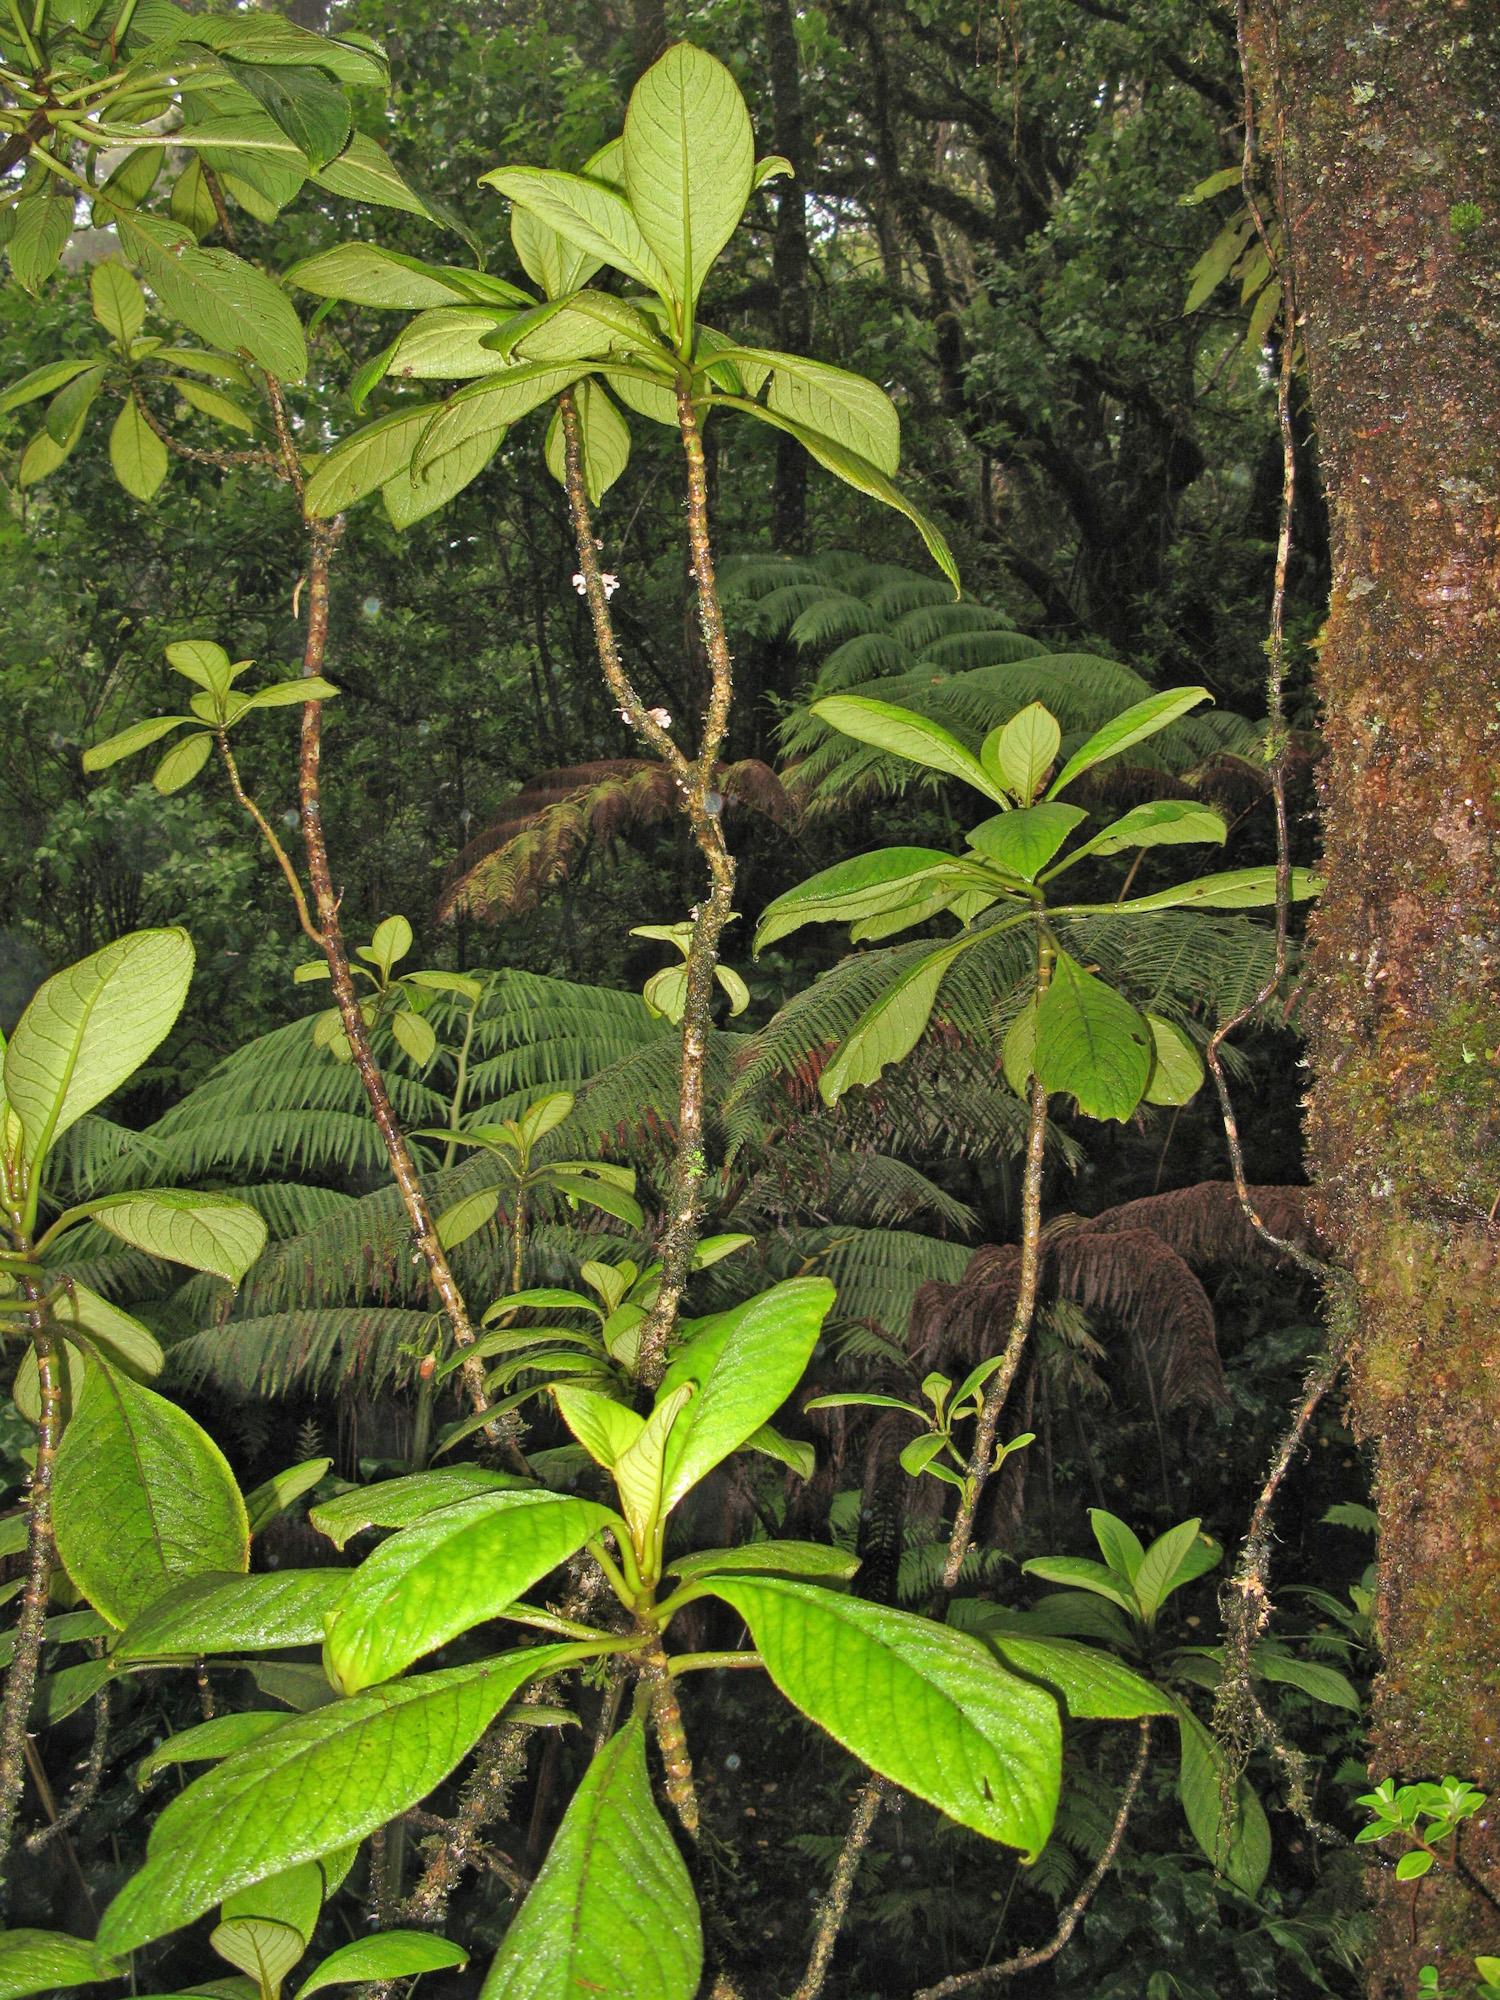 cyrtandra wagneri